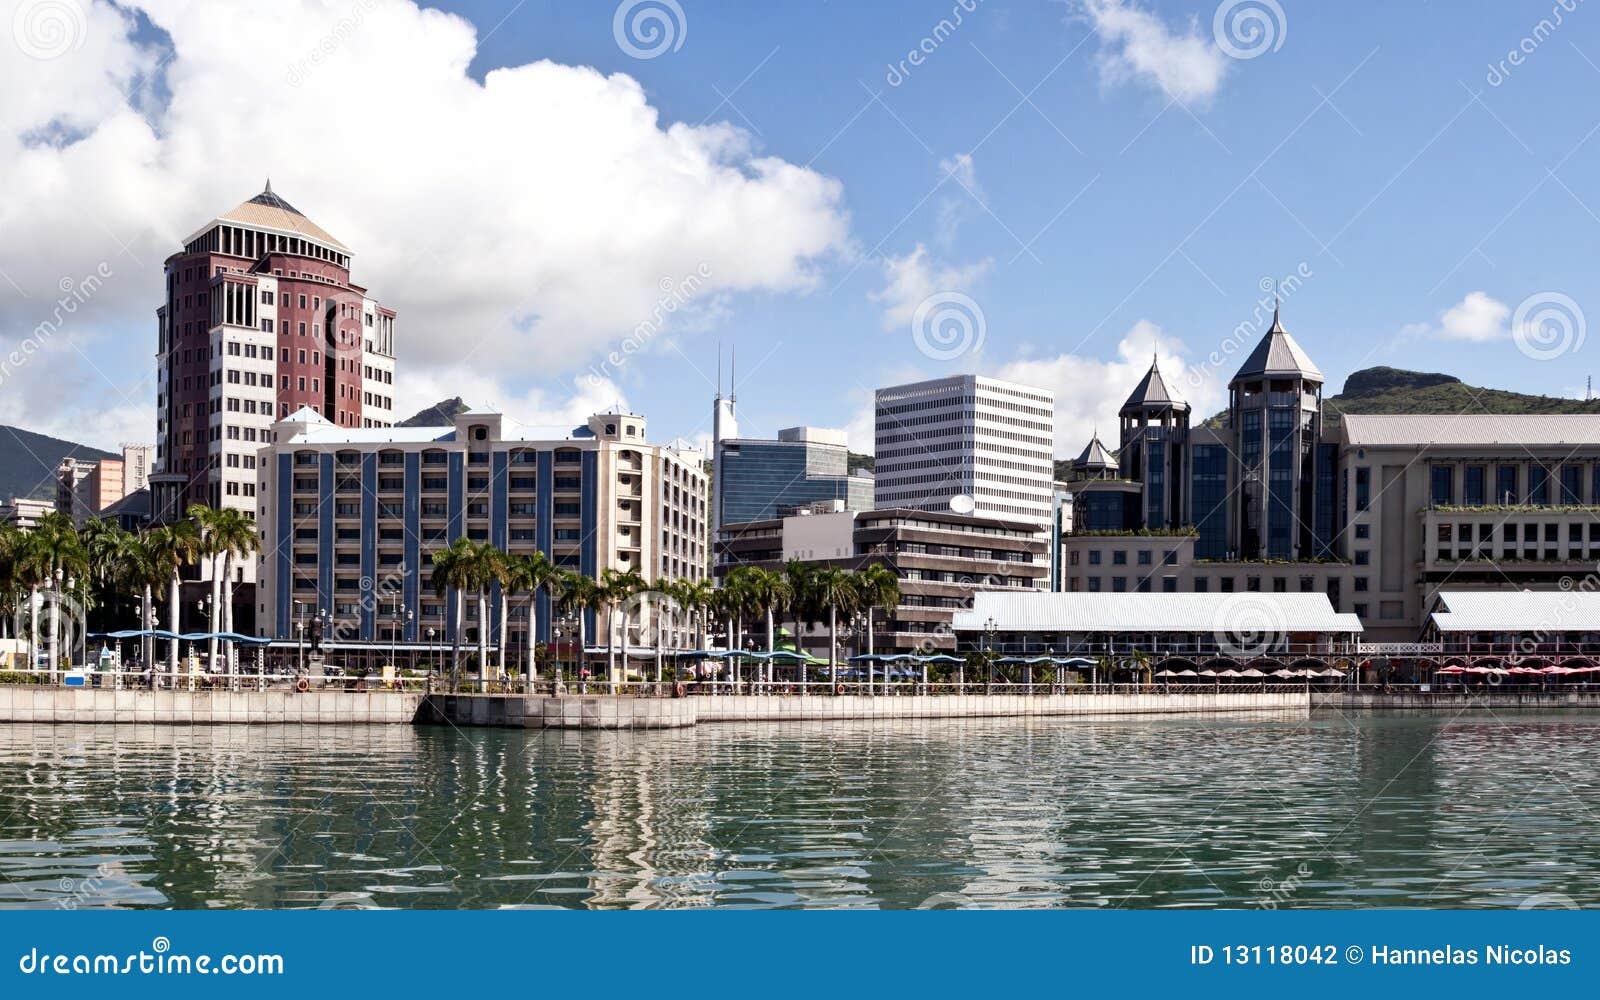 Port louis waterfront mauritius stock photography image 13118042 - Restaurant port louis ile maurice ...